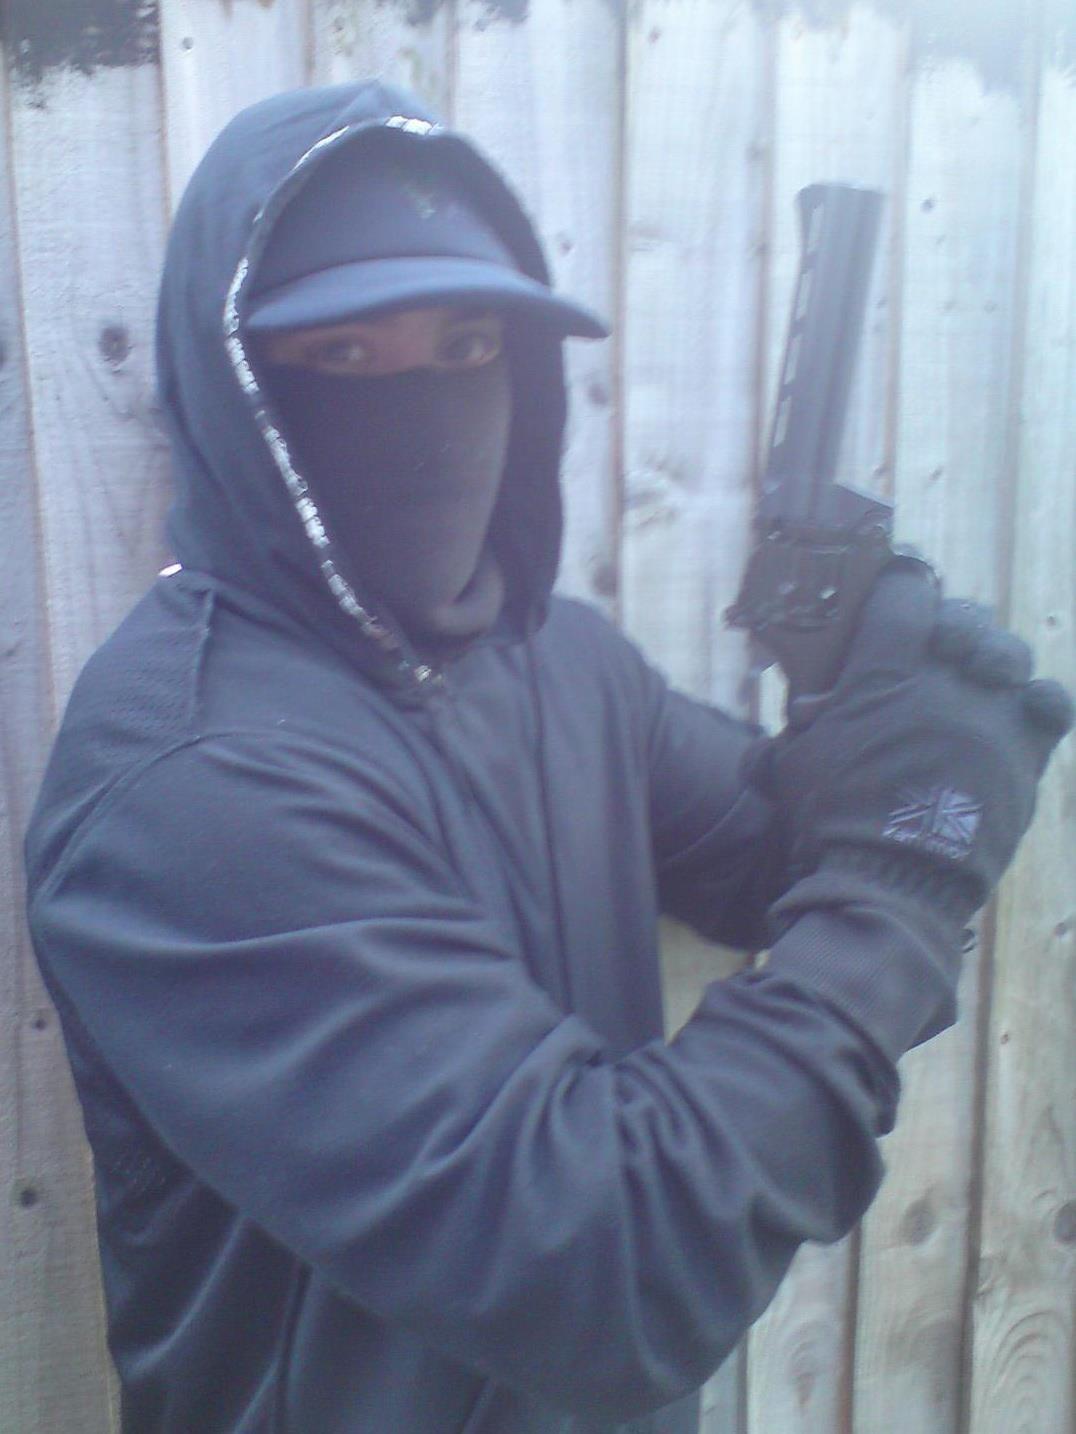 gun crime chic #scally #balaclava #violence | cool | Pinterest ...